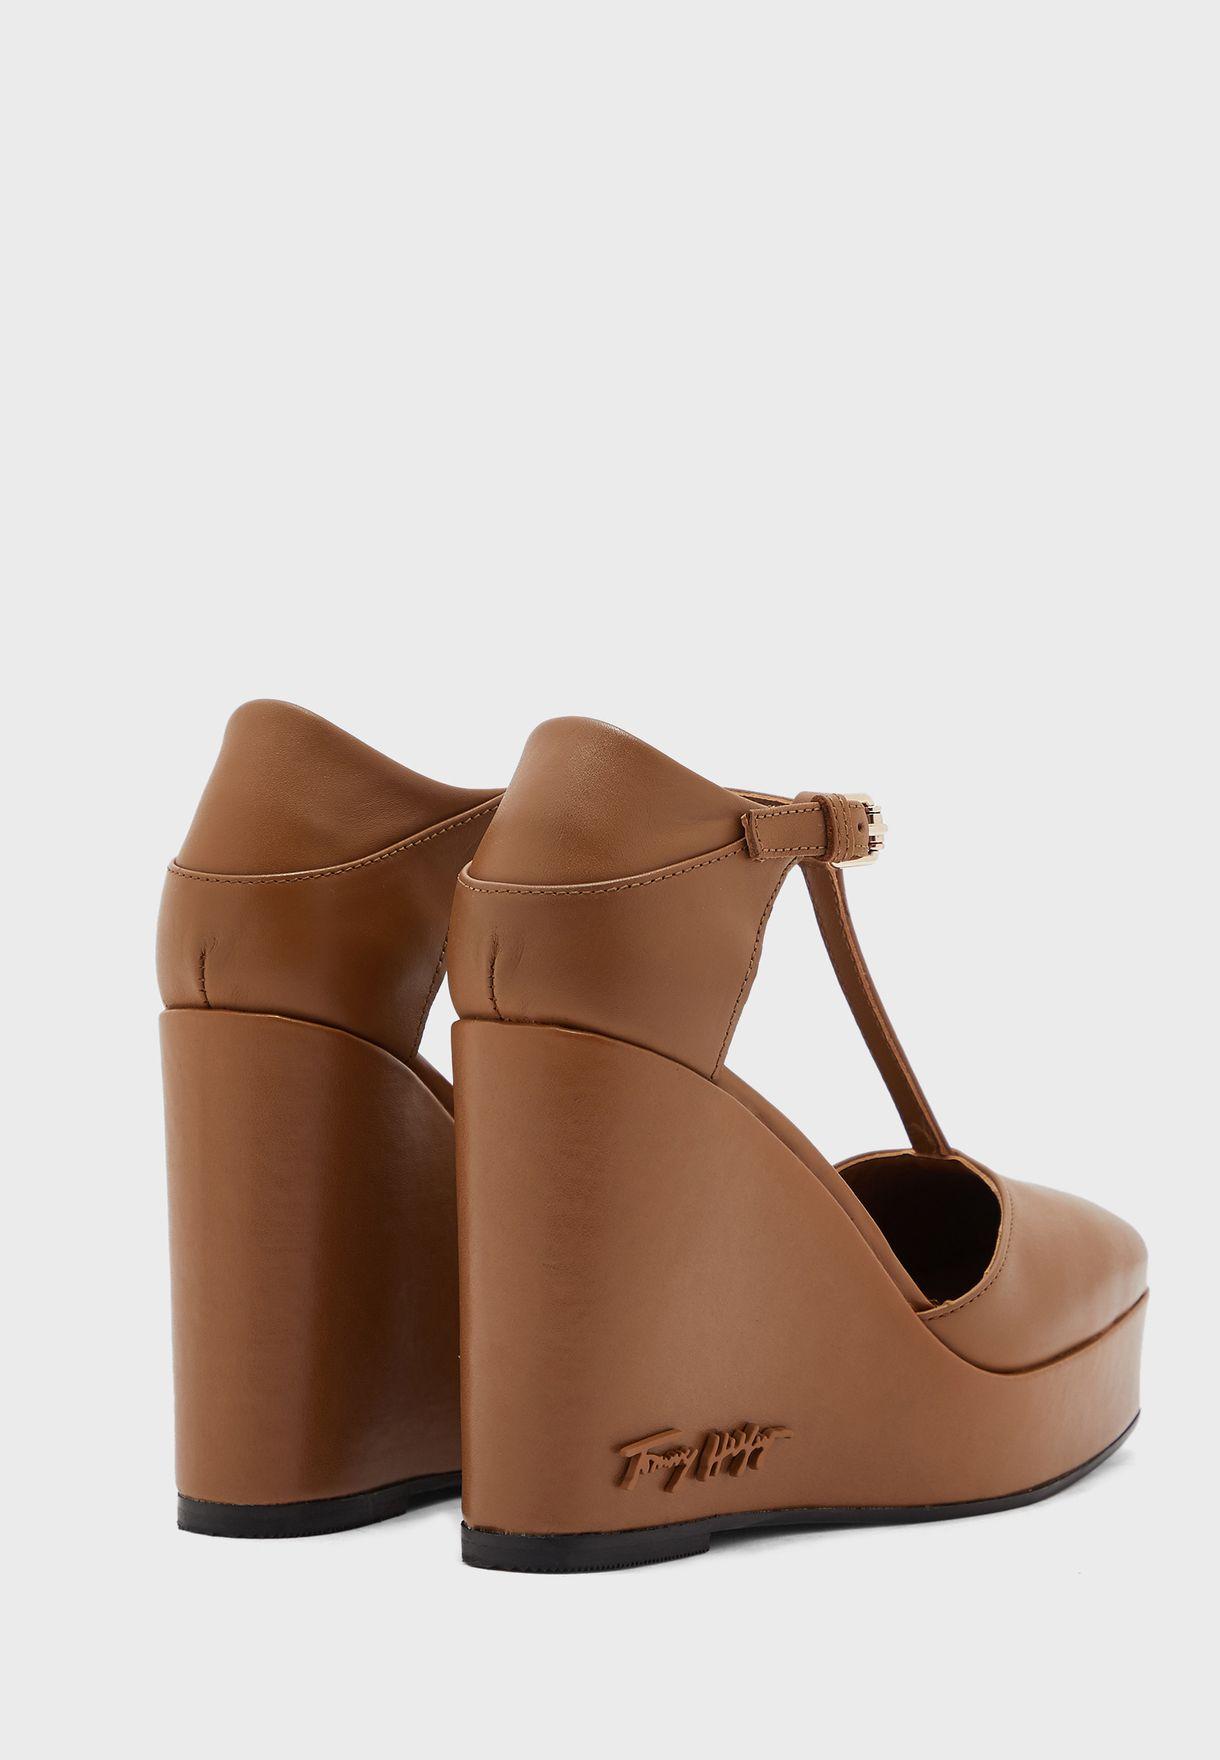 Feminine High Heel Wedge Pump